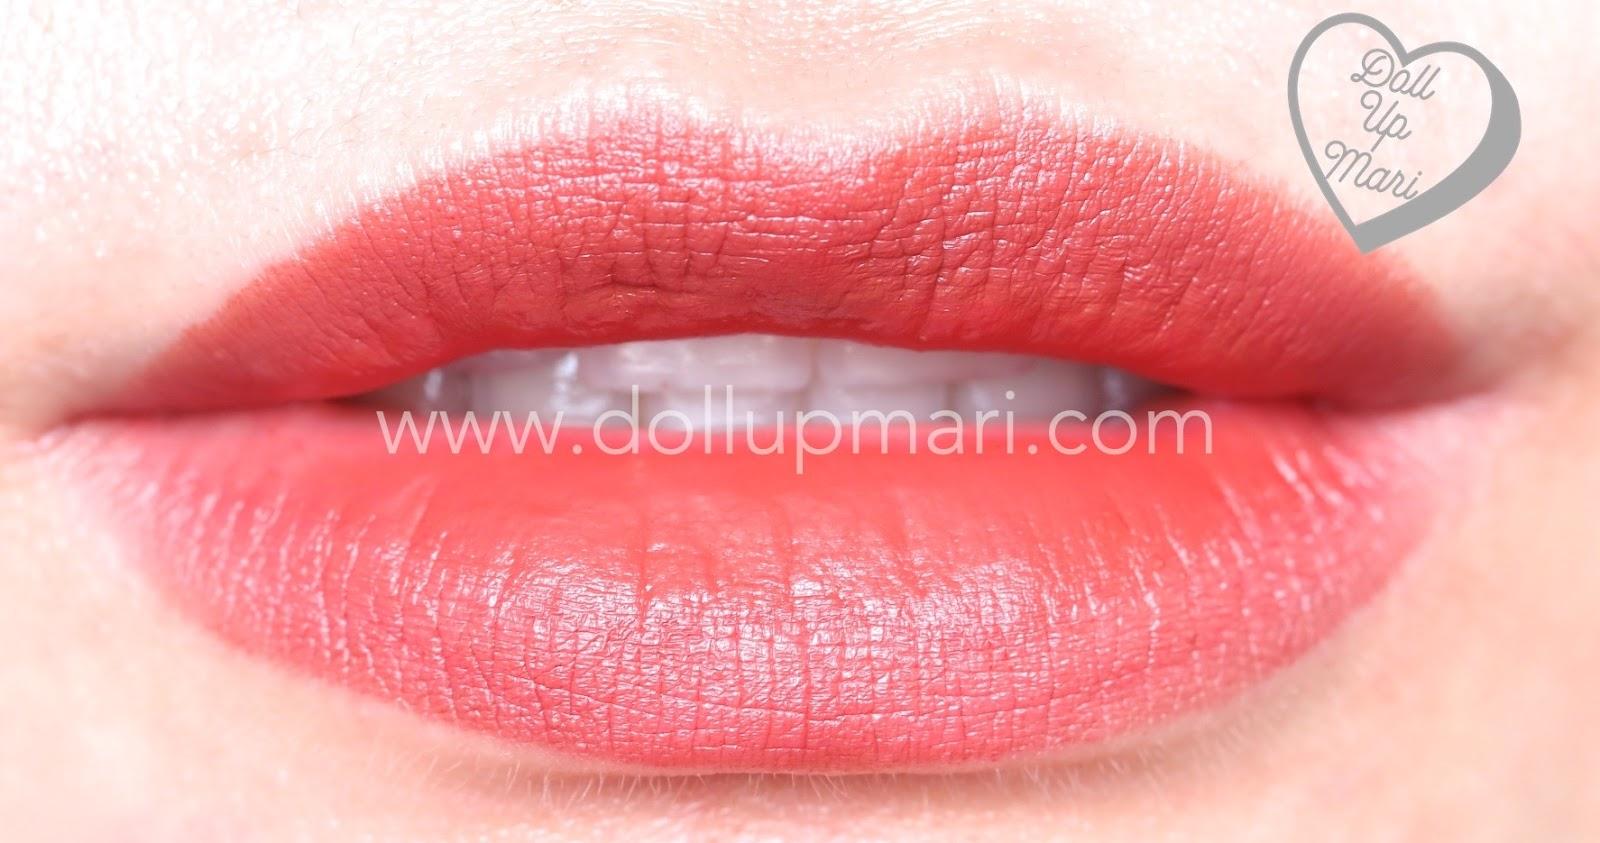 lip swatch of Silkygirl OMG! Powder Matte Lipcolor Lipstick (04-Maroon)